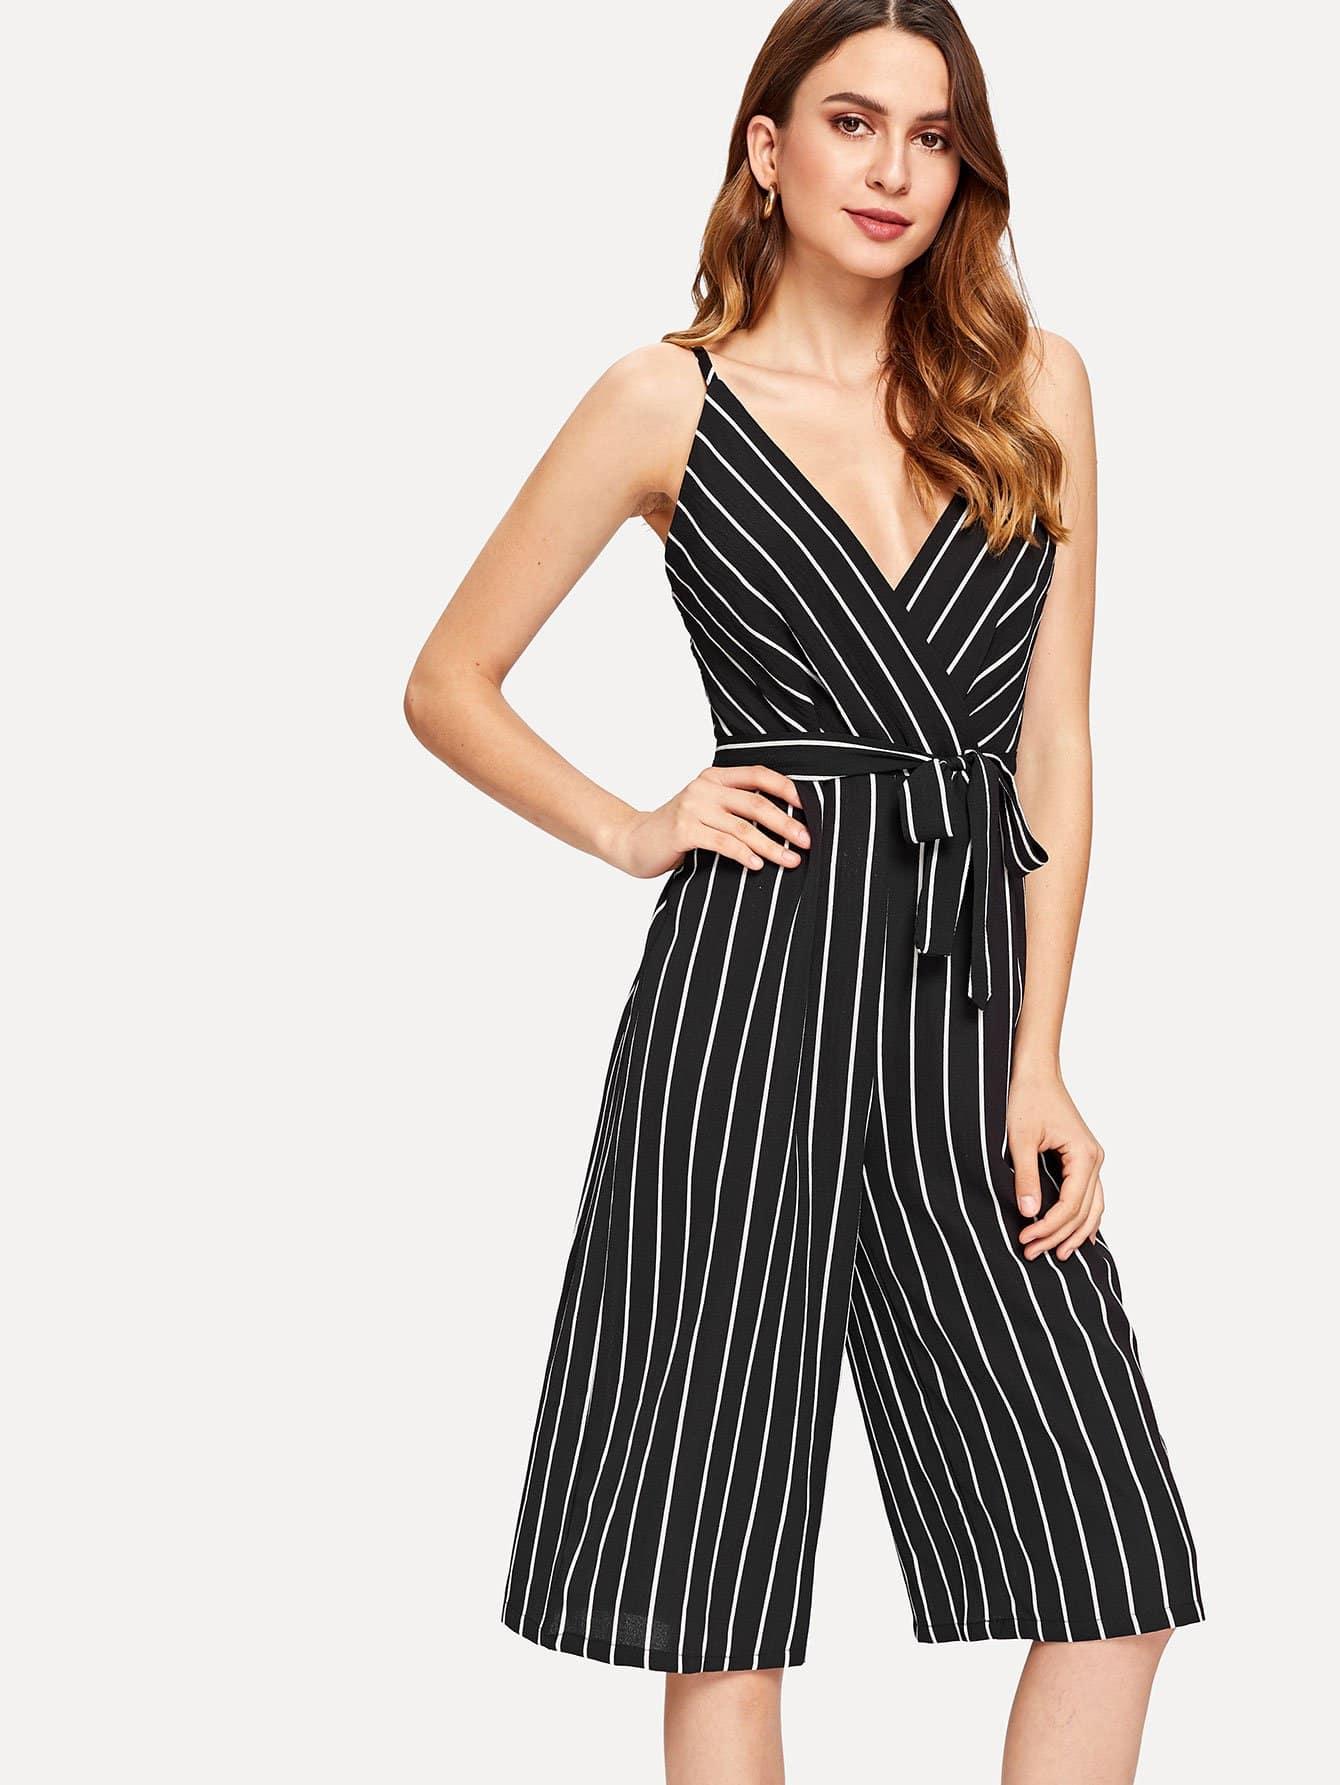 Self Tie Waist Striped Cami Jumpsuit striped ruffled waist self tie pants